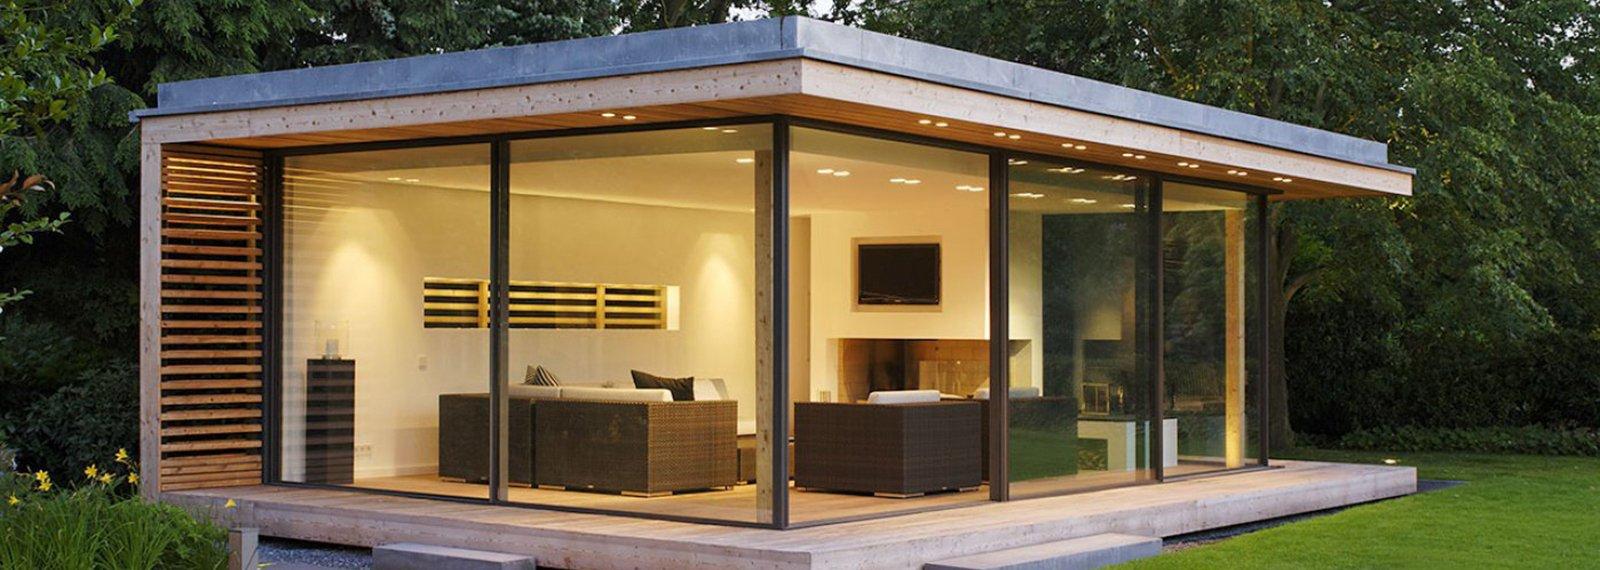 Studio De Jardin Bois Habitable Pool House Extension Maison avec Maison De Jardin En Bois Habitable